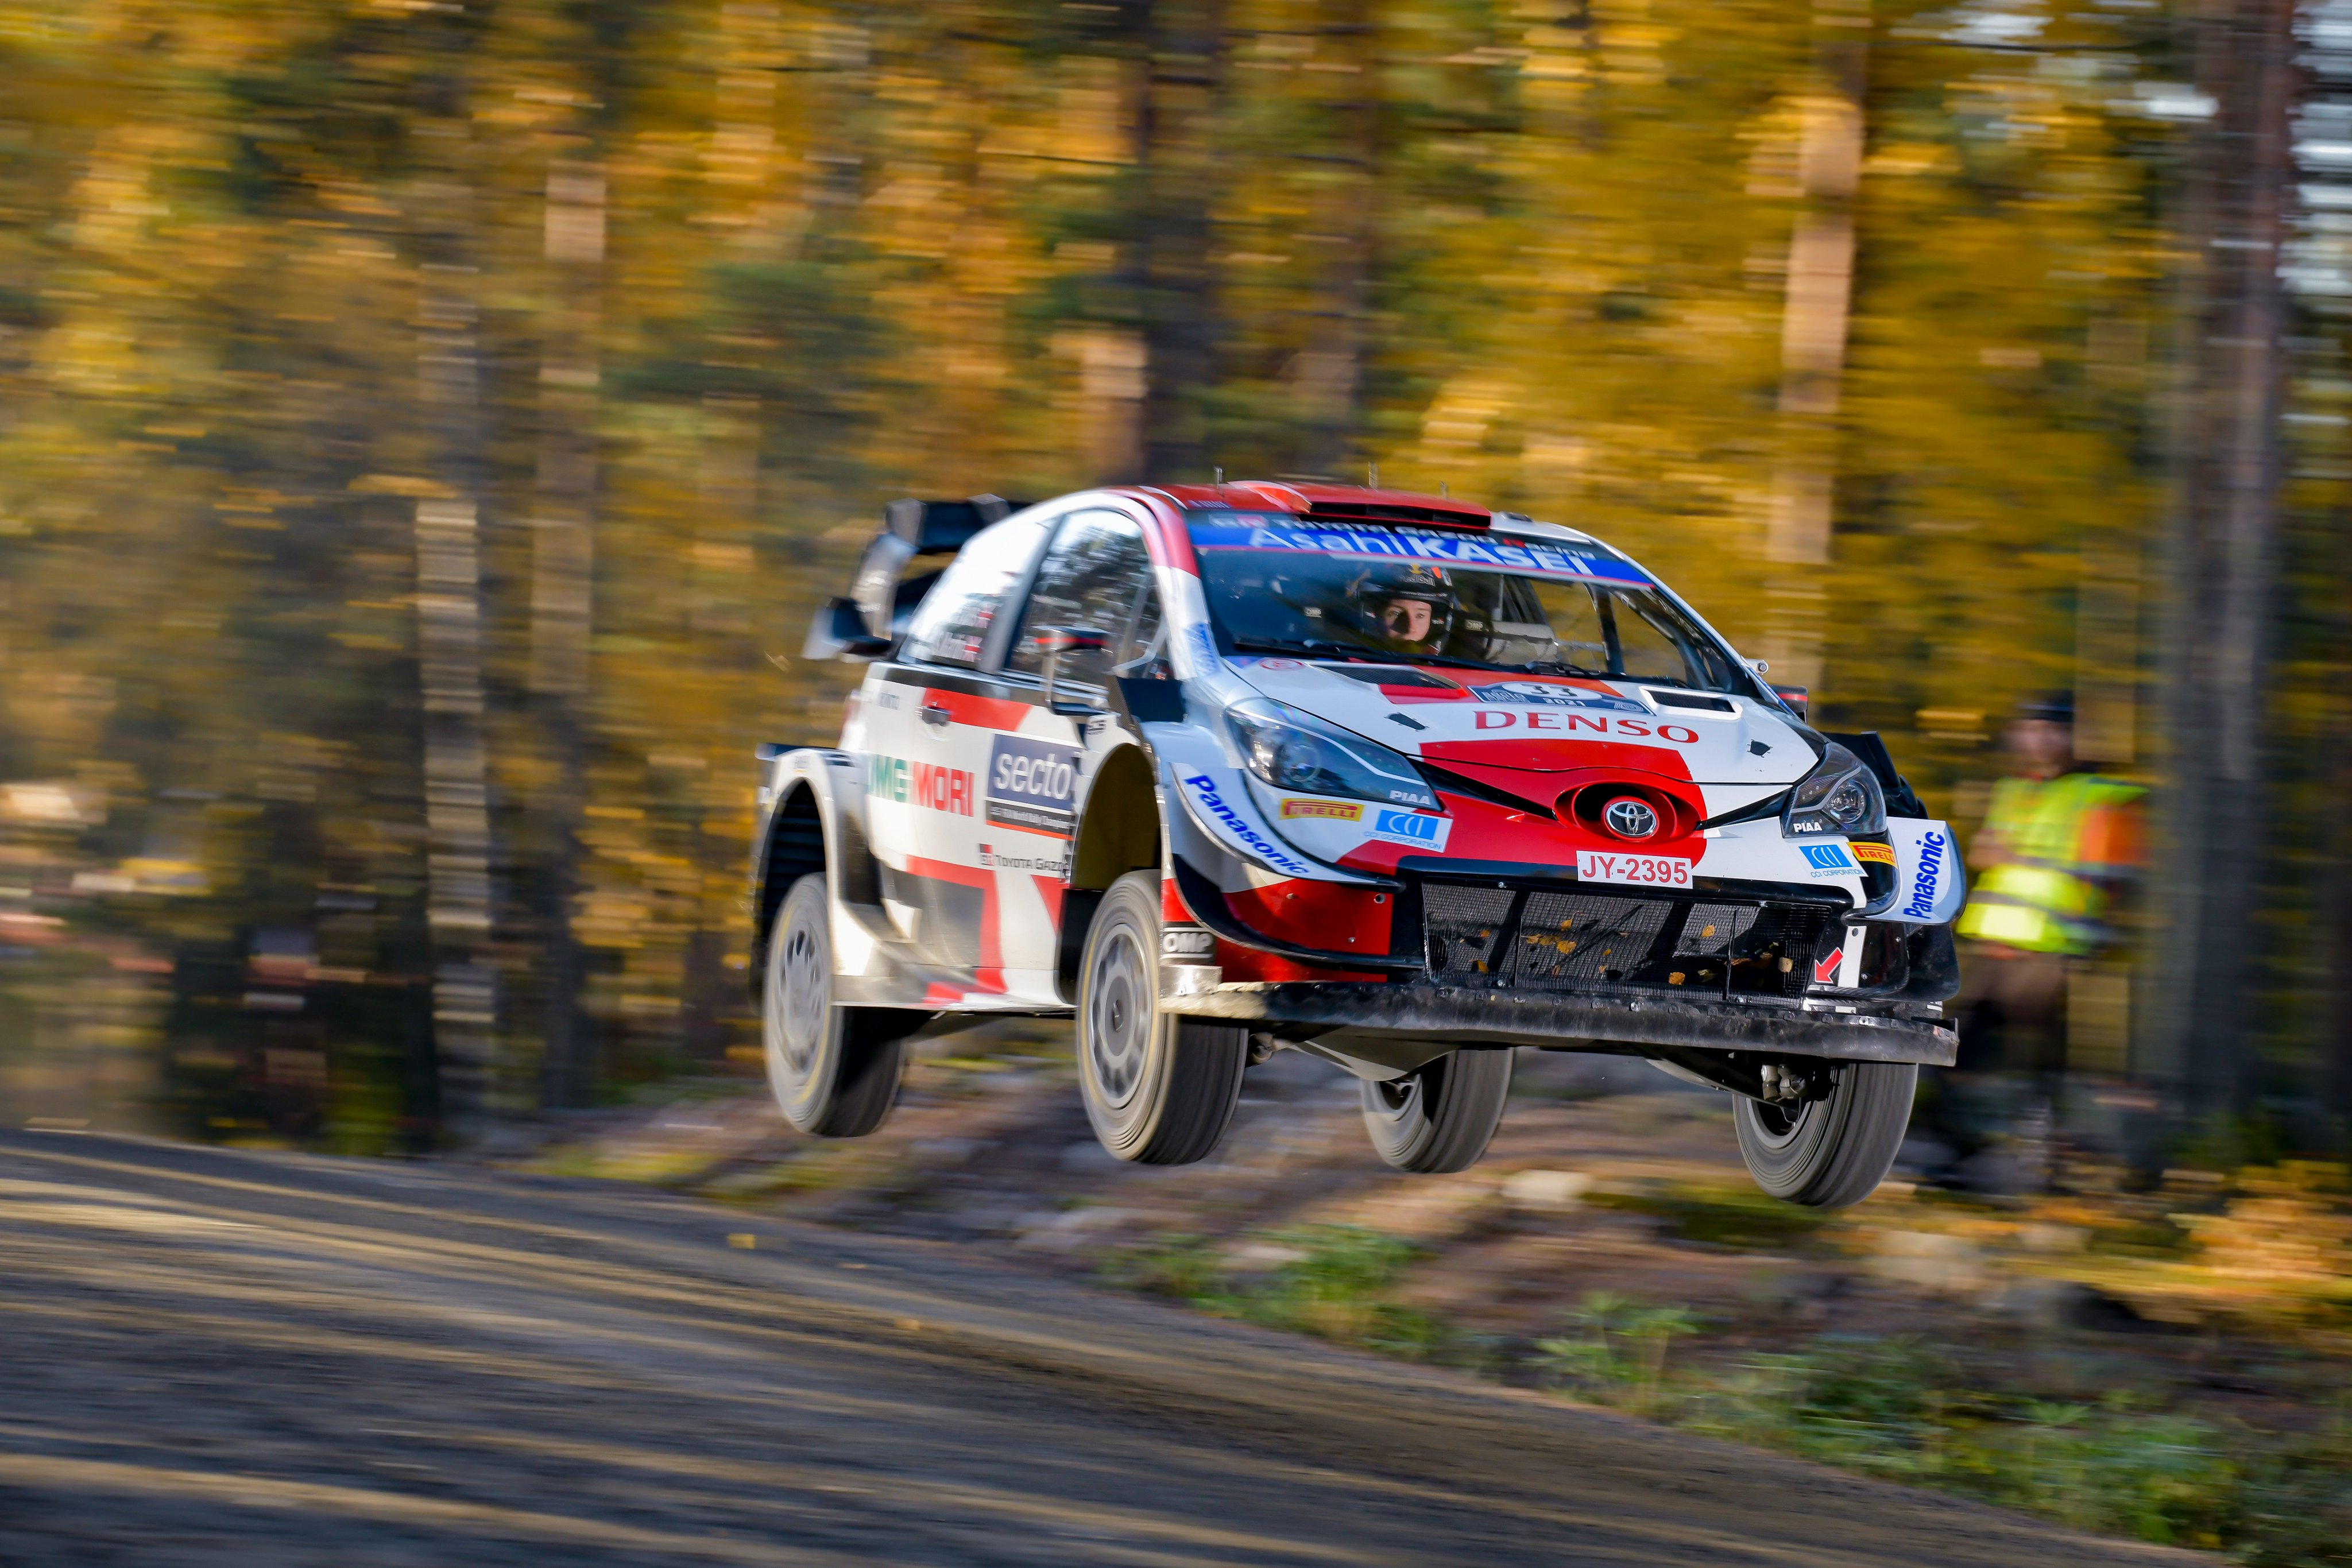 WRC: 70º SECTO Rally Finland [1-3 Octubre] - Página 3 FAxUw5nWQAMw7cC?format=jpg&name=4096x4096